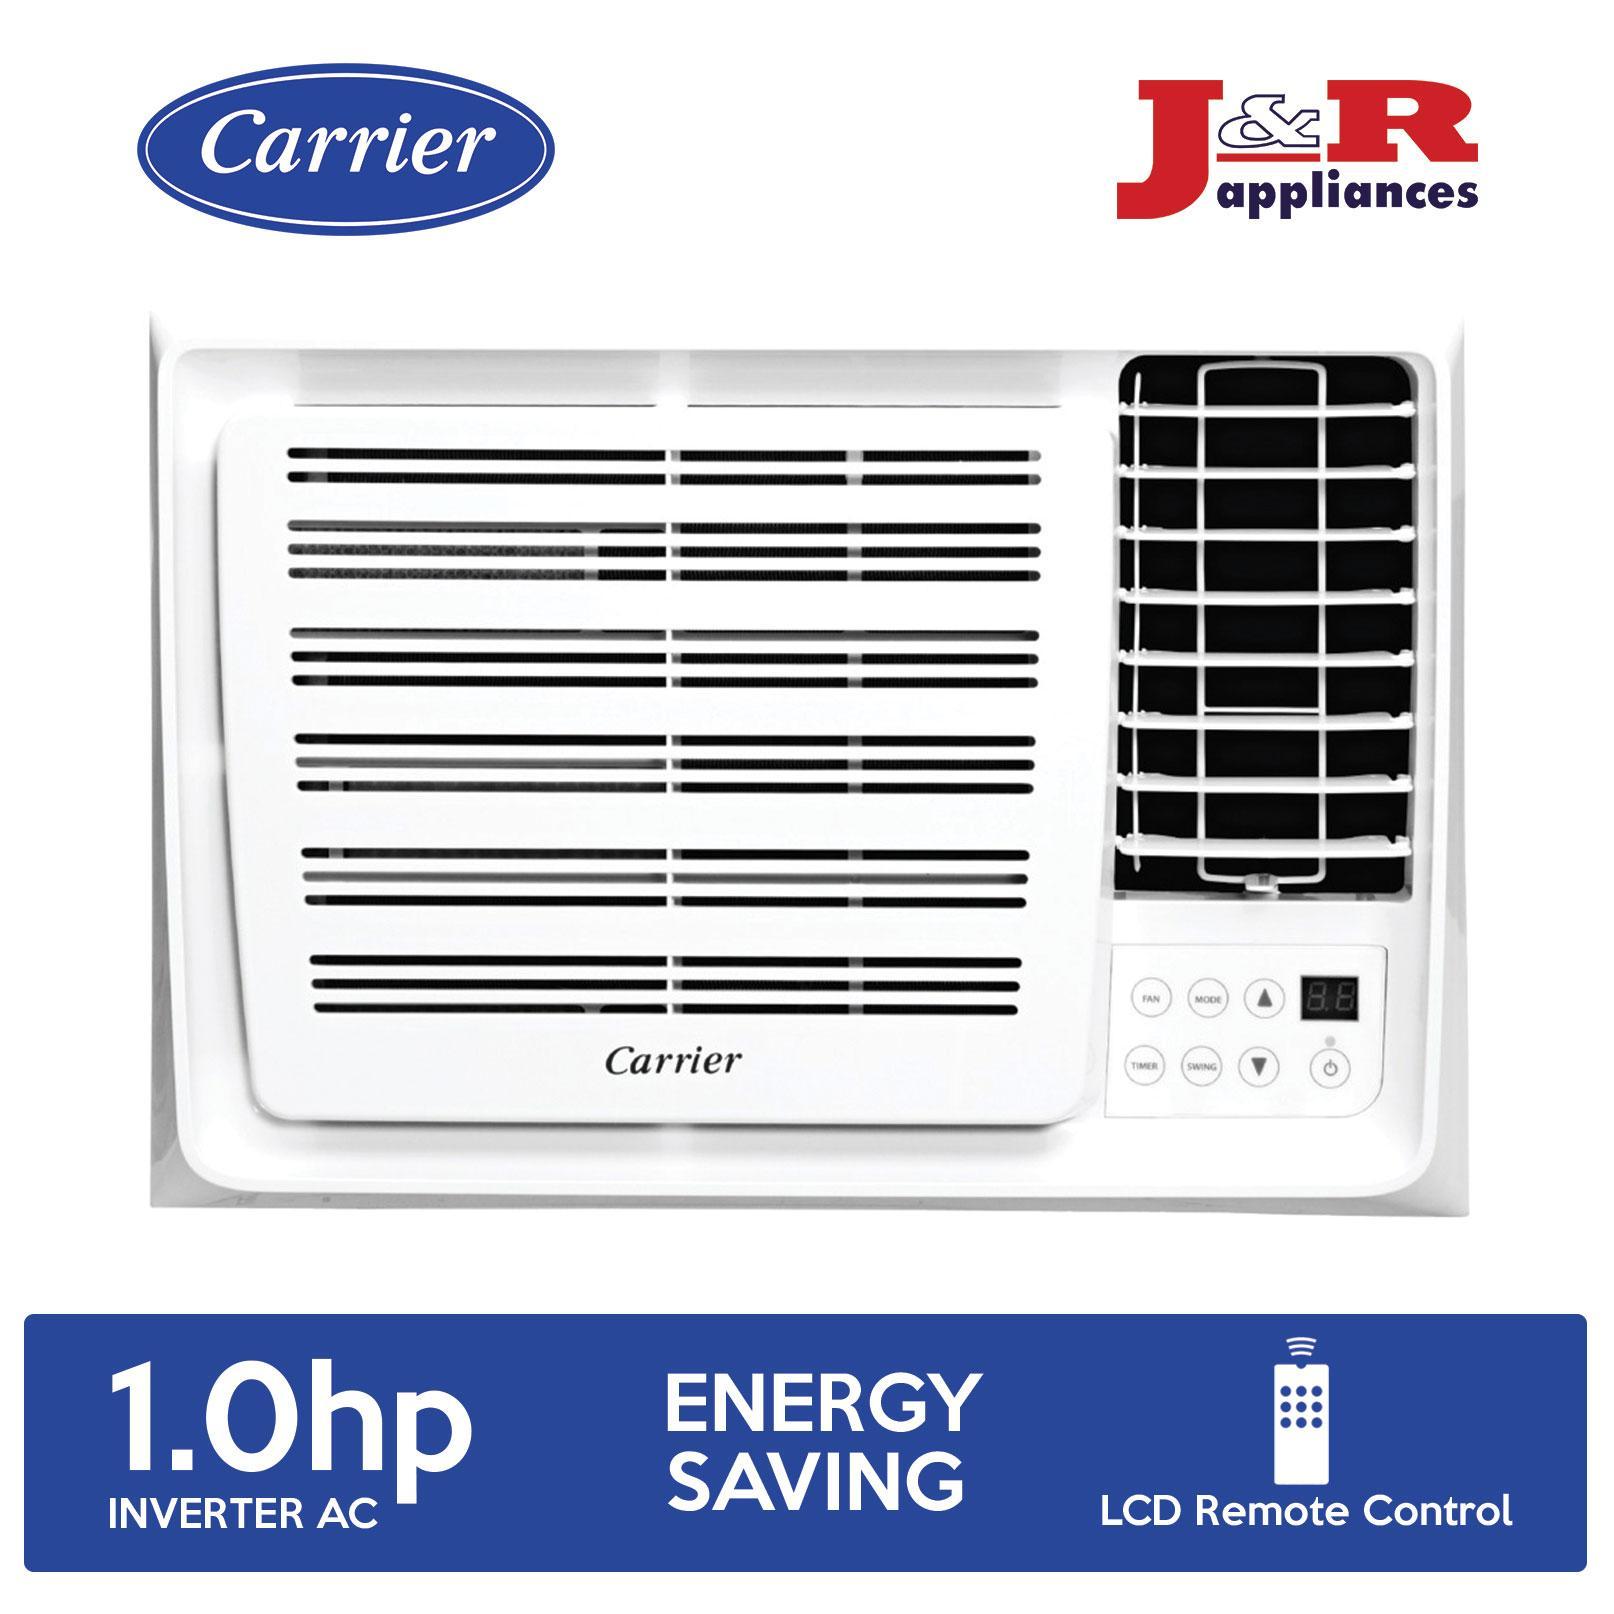 Carrier WCARH009EEV Window Aircon 1 0HP Inverter